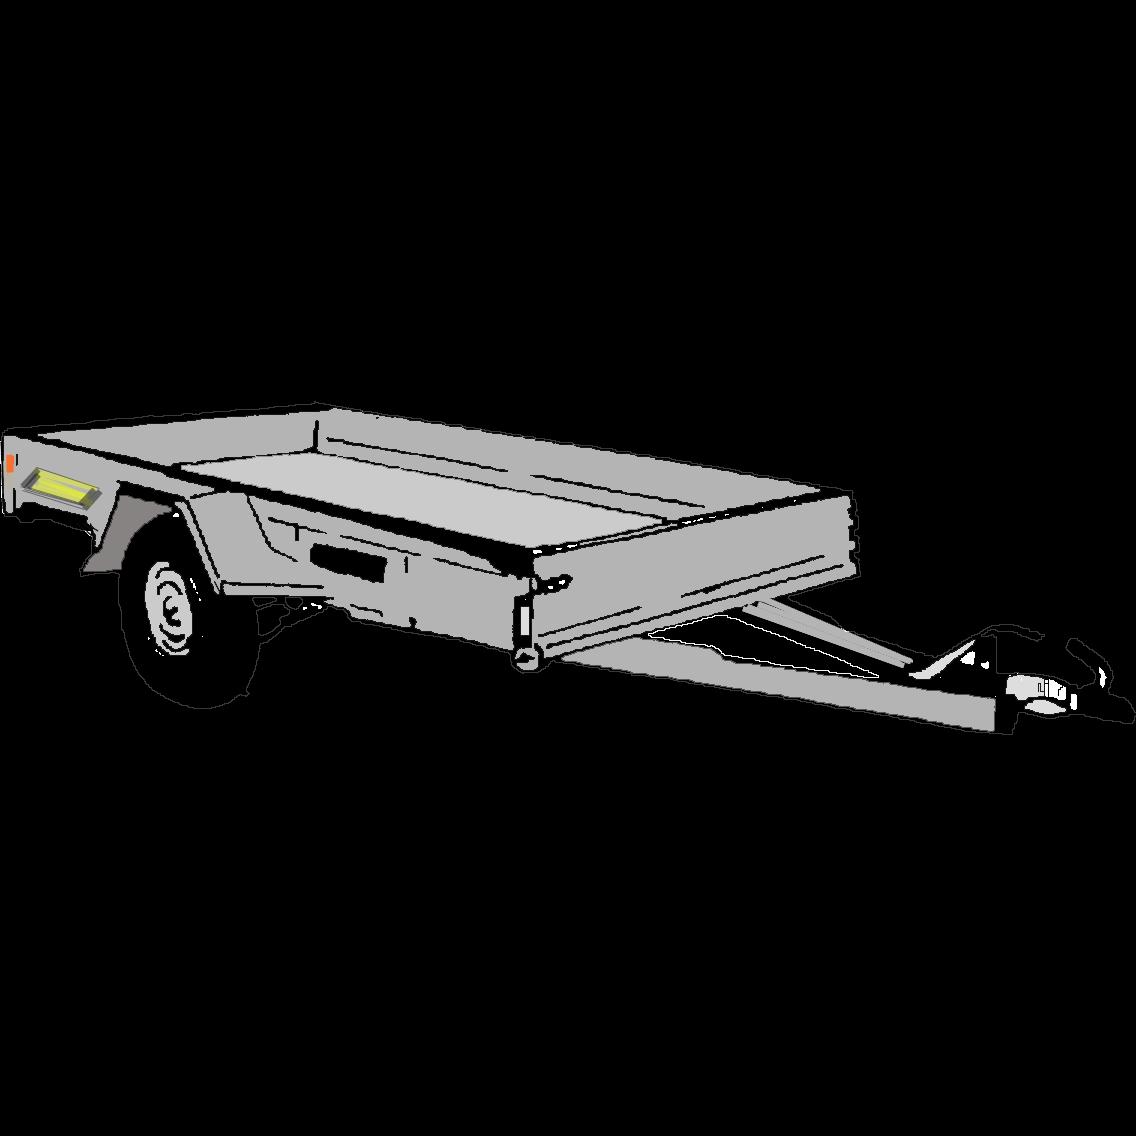 Släpvagn, totalvikt 1000 kg, bromsad (Heco aluminium)